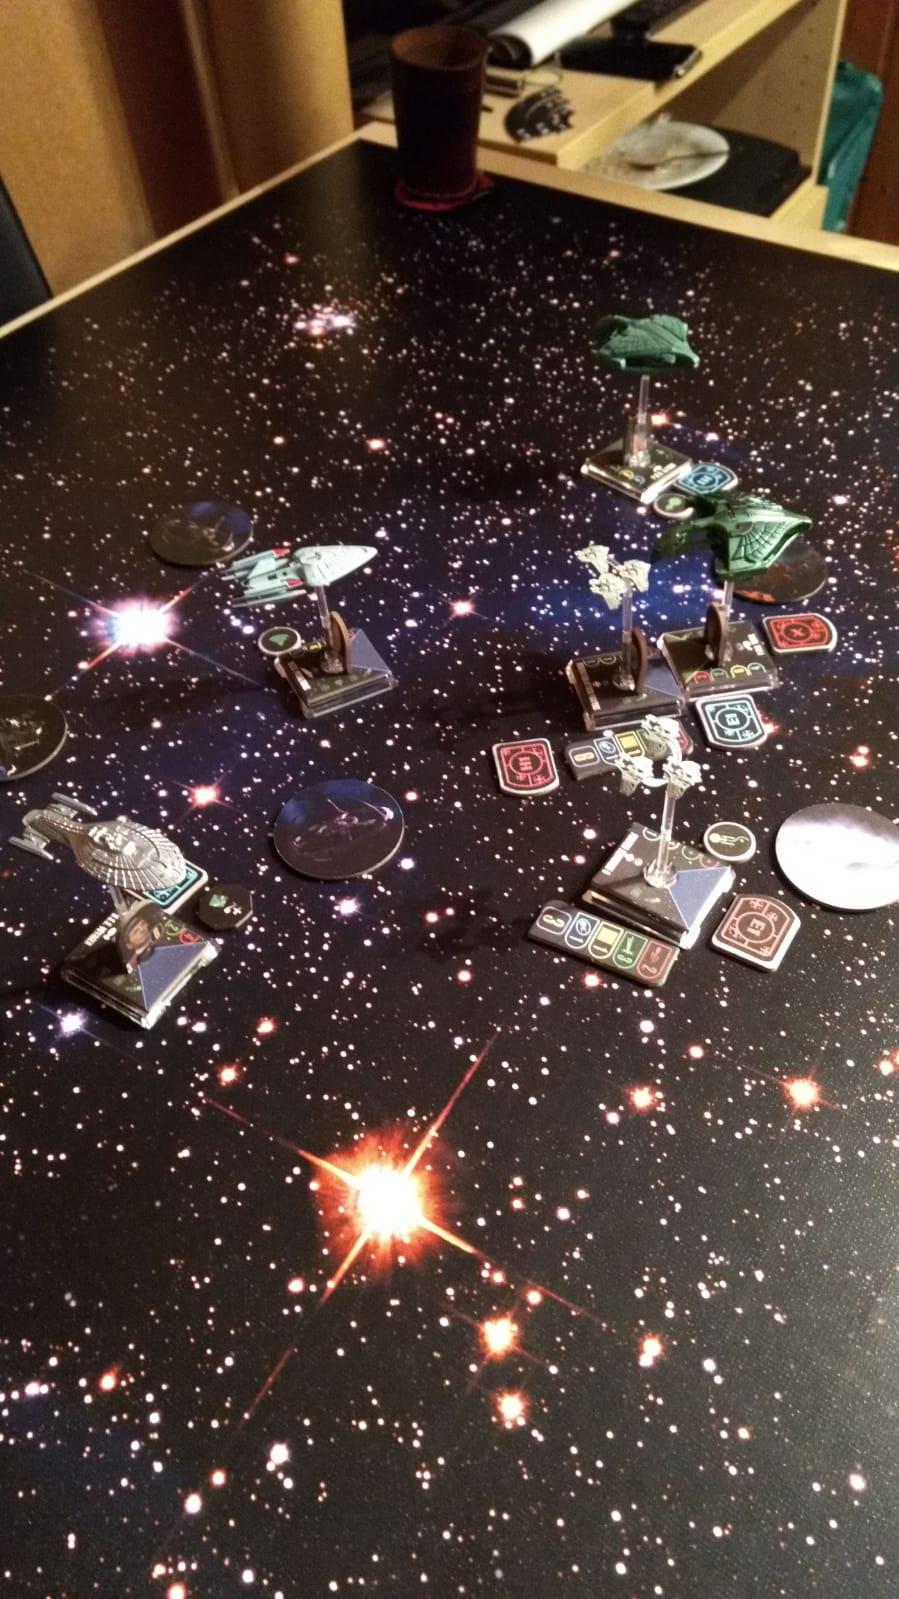 Kampf um Jouret [Föd. vs. Romulaner] Spiel610